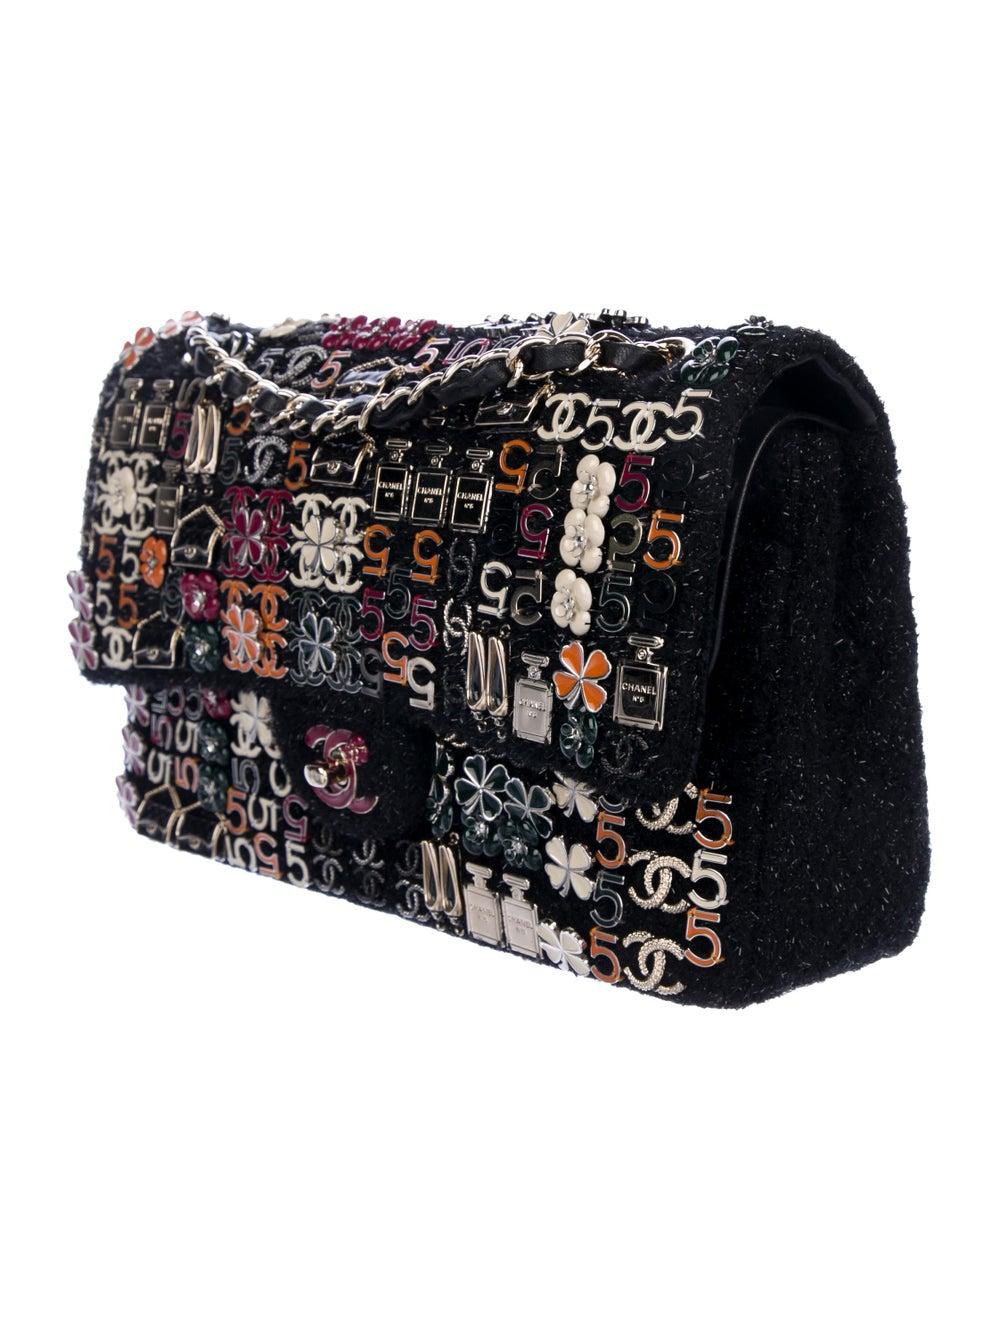 Chanel Enamel Jeweled Tweed Flap Bag Black - image 3